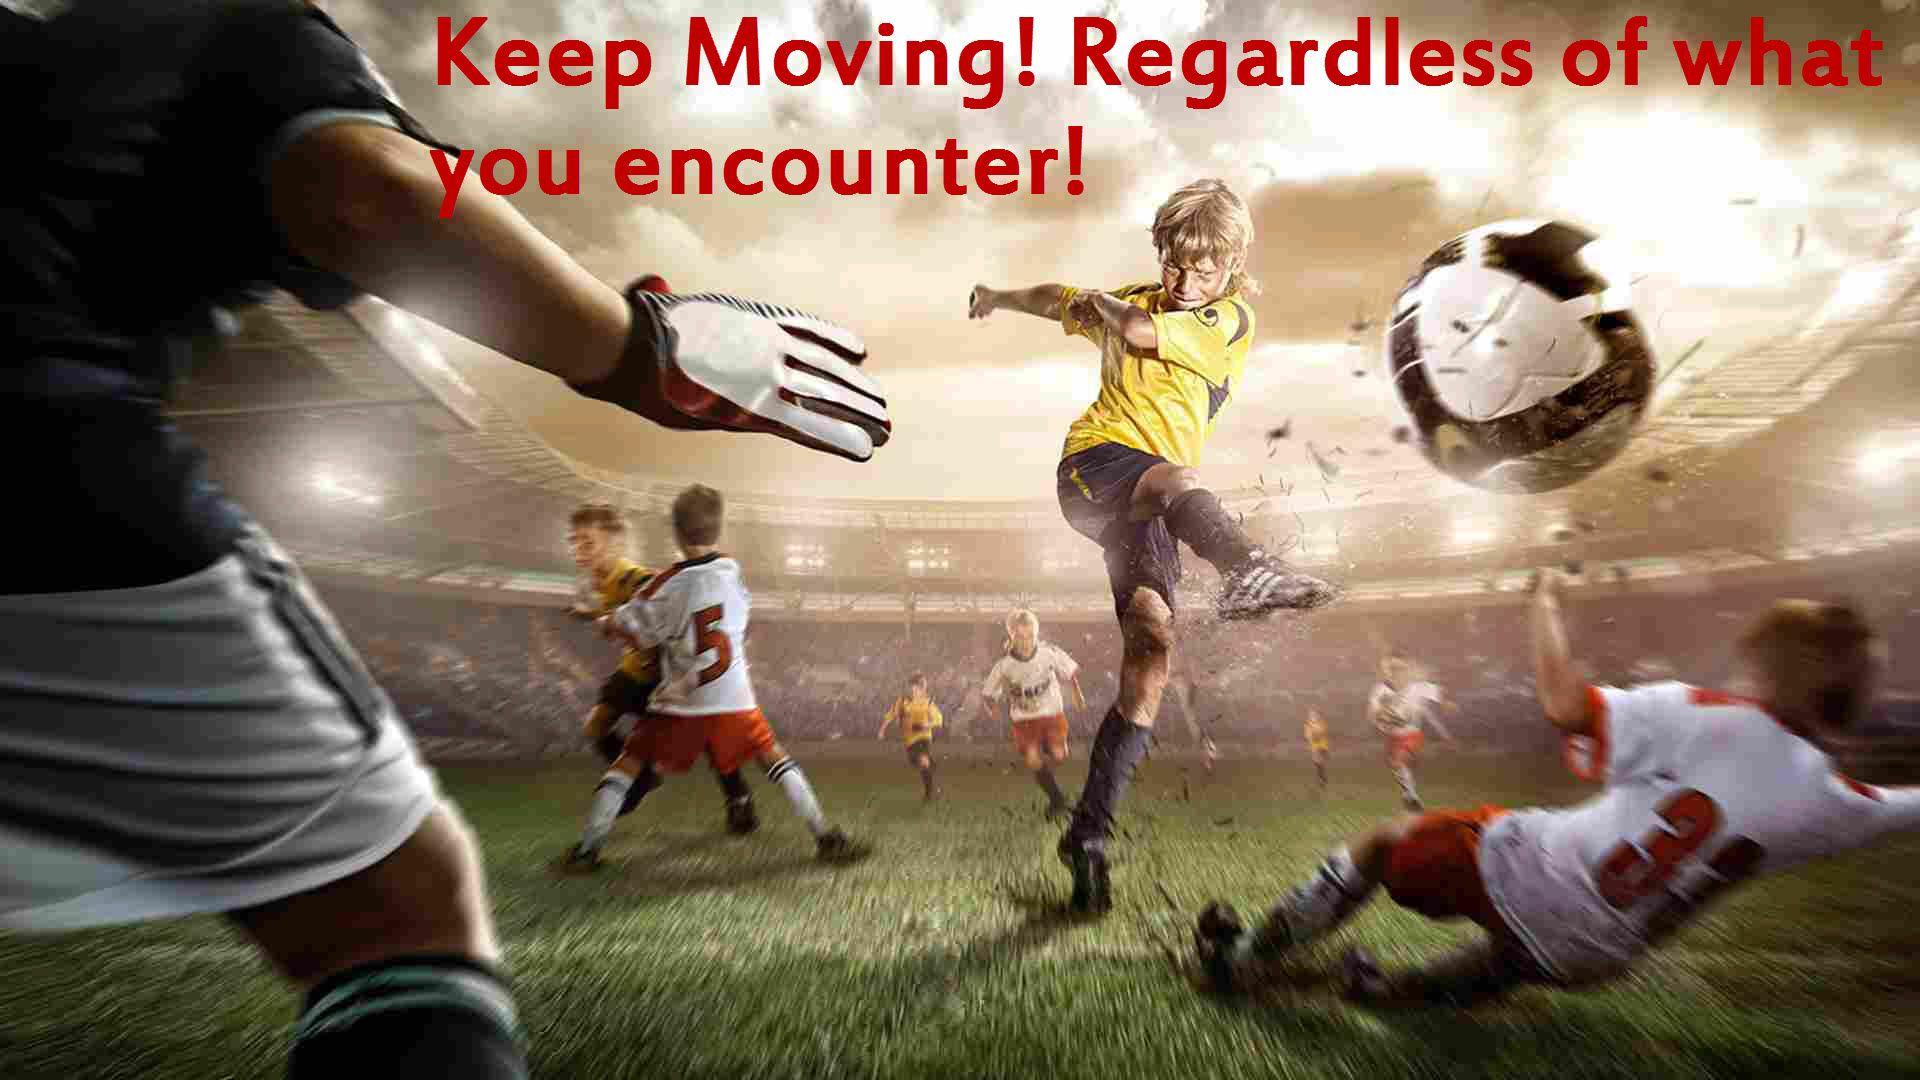 Keep Moving Sports Wallpapers Football Kids Kids Sports